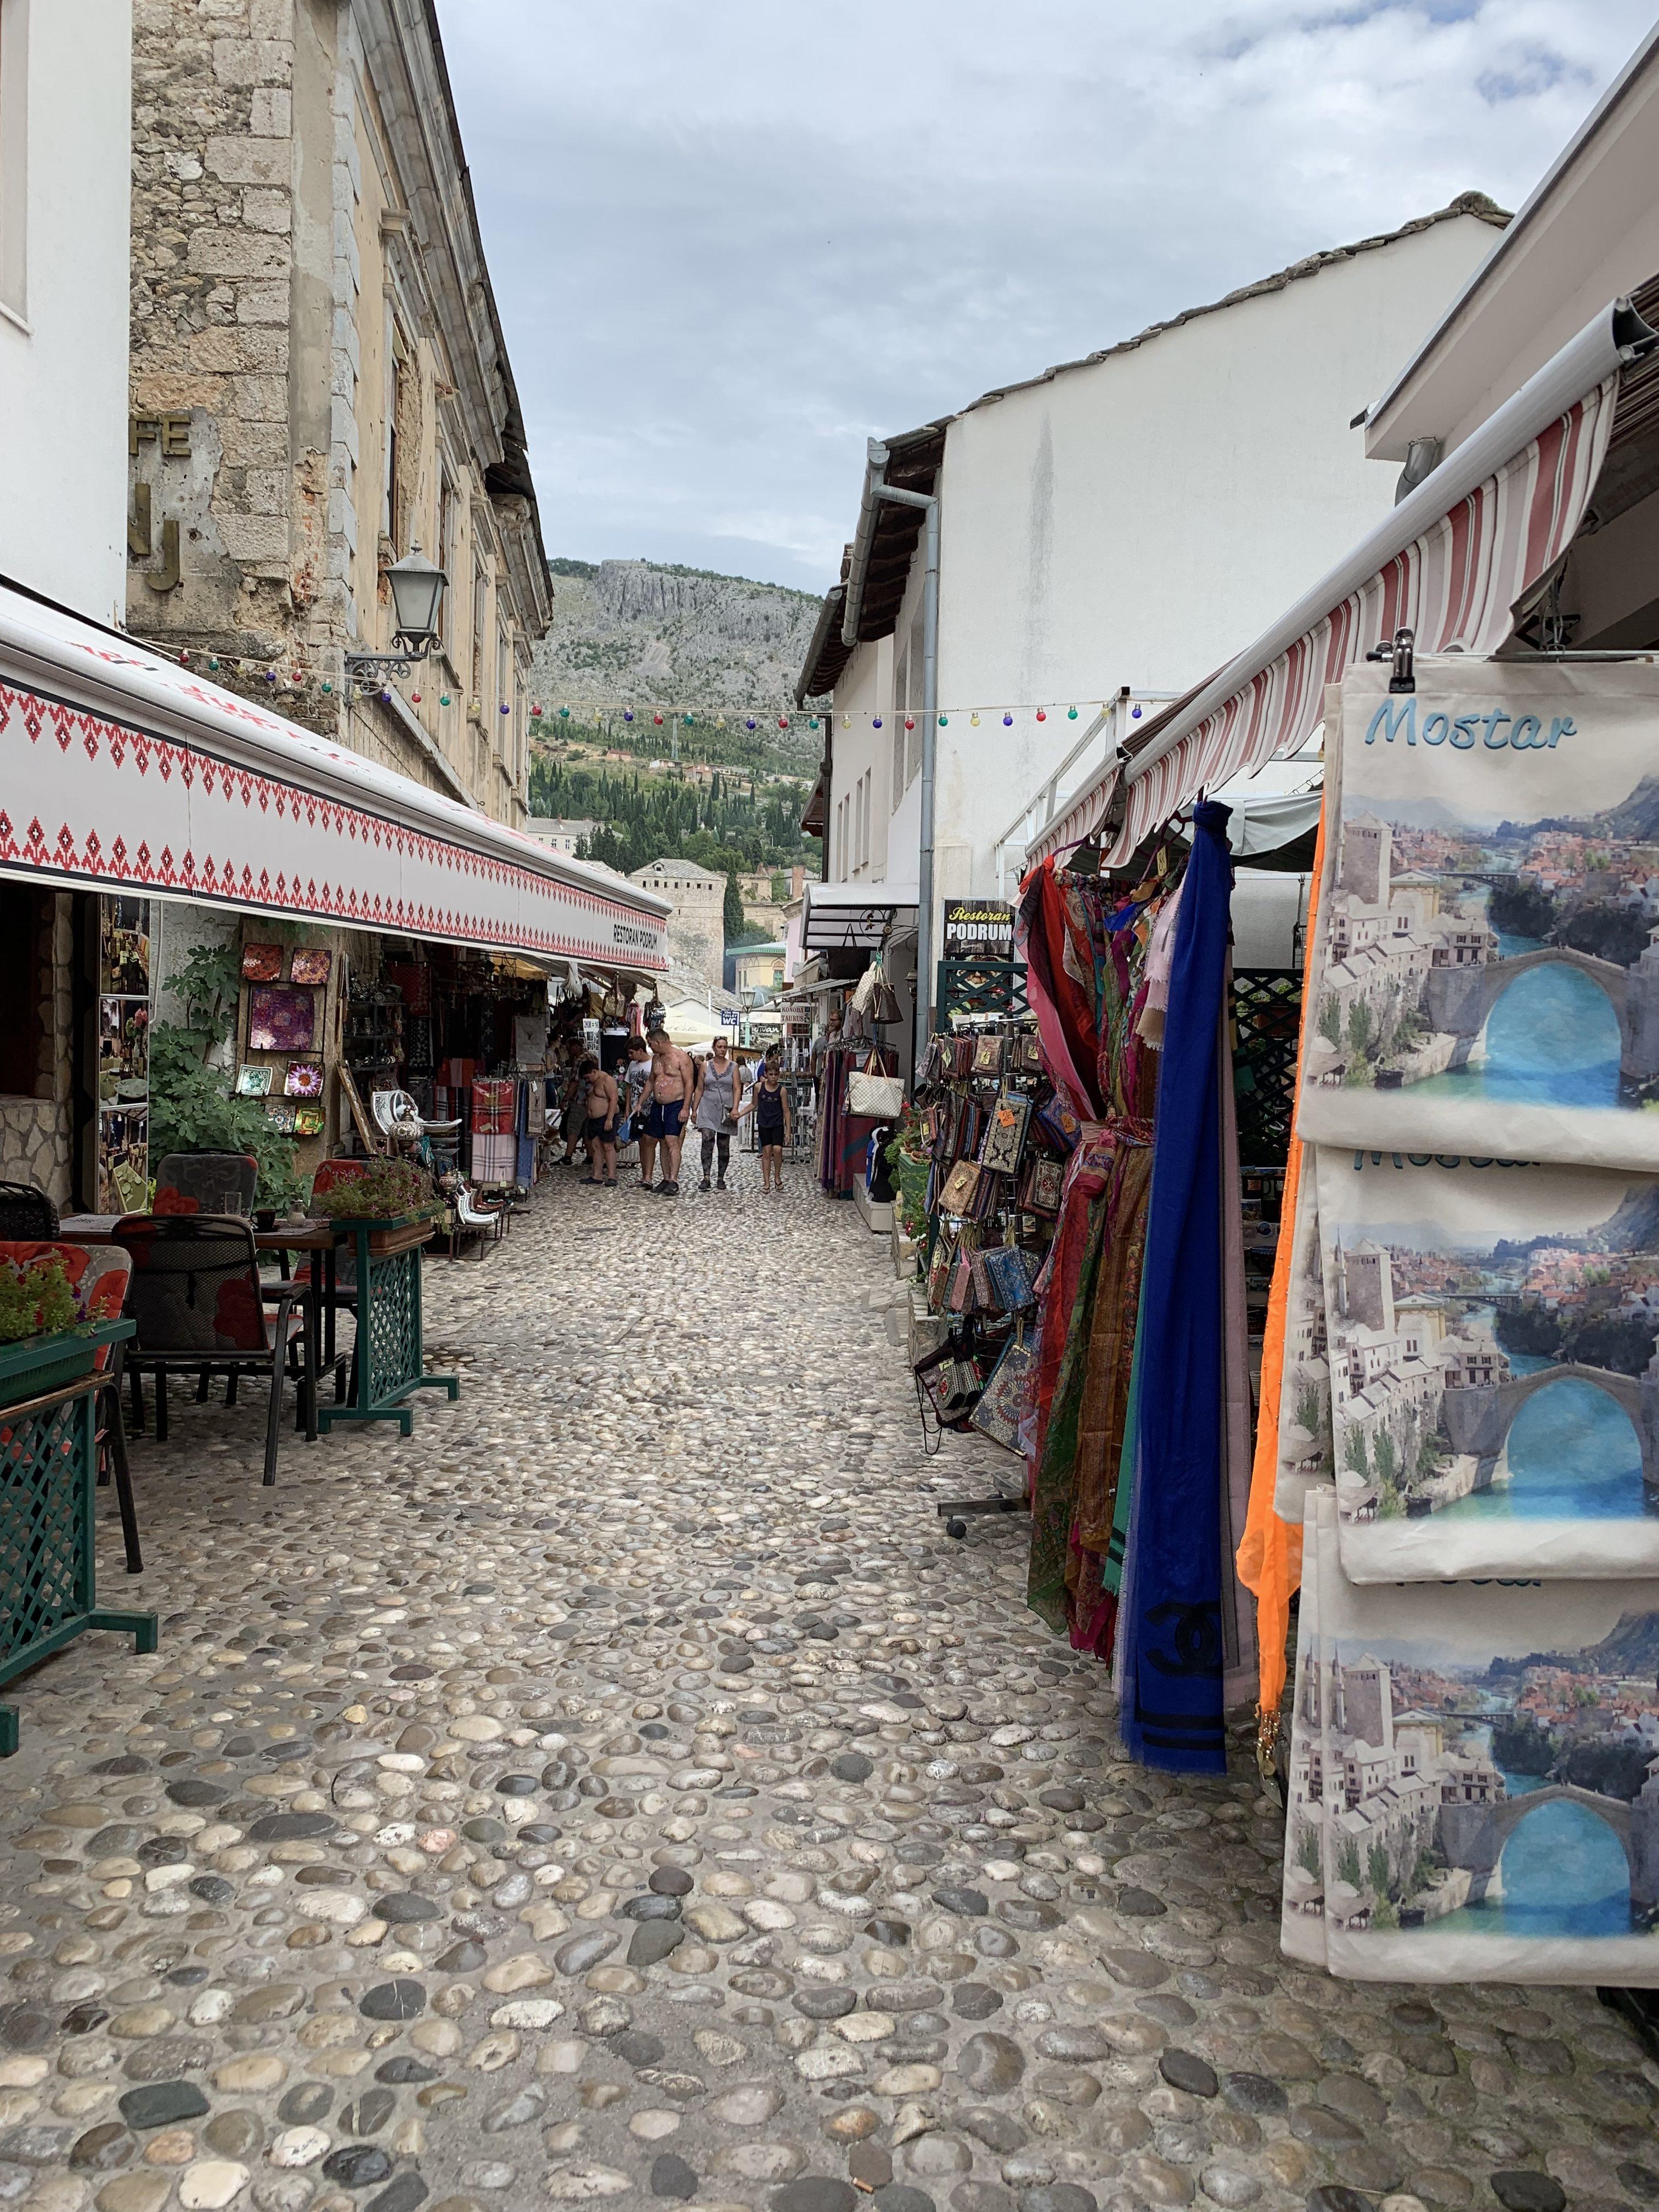 Mostar_24_luogolungo